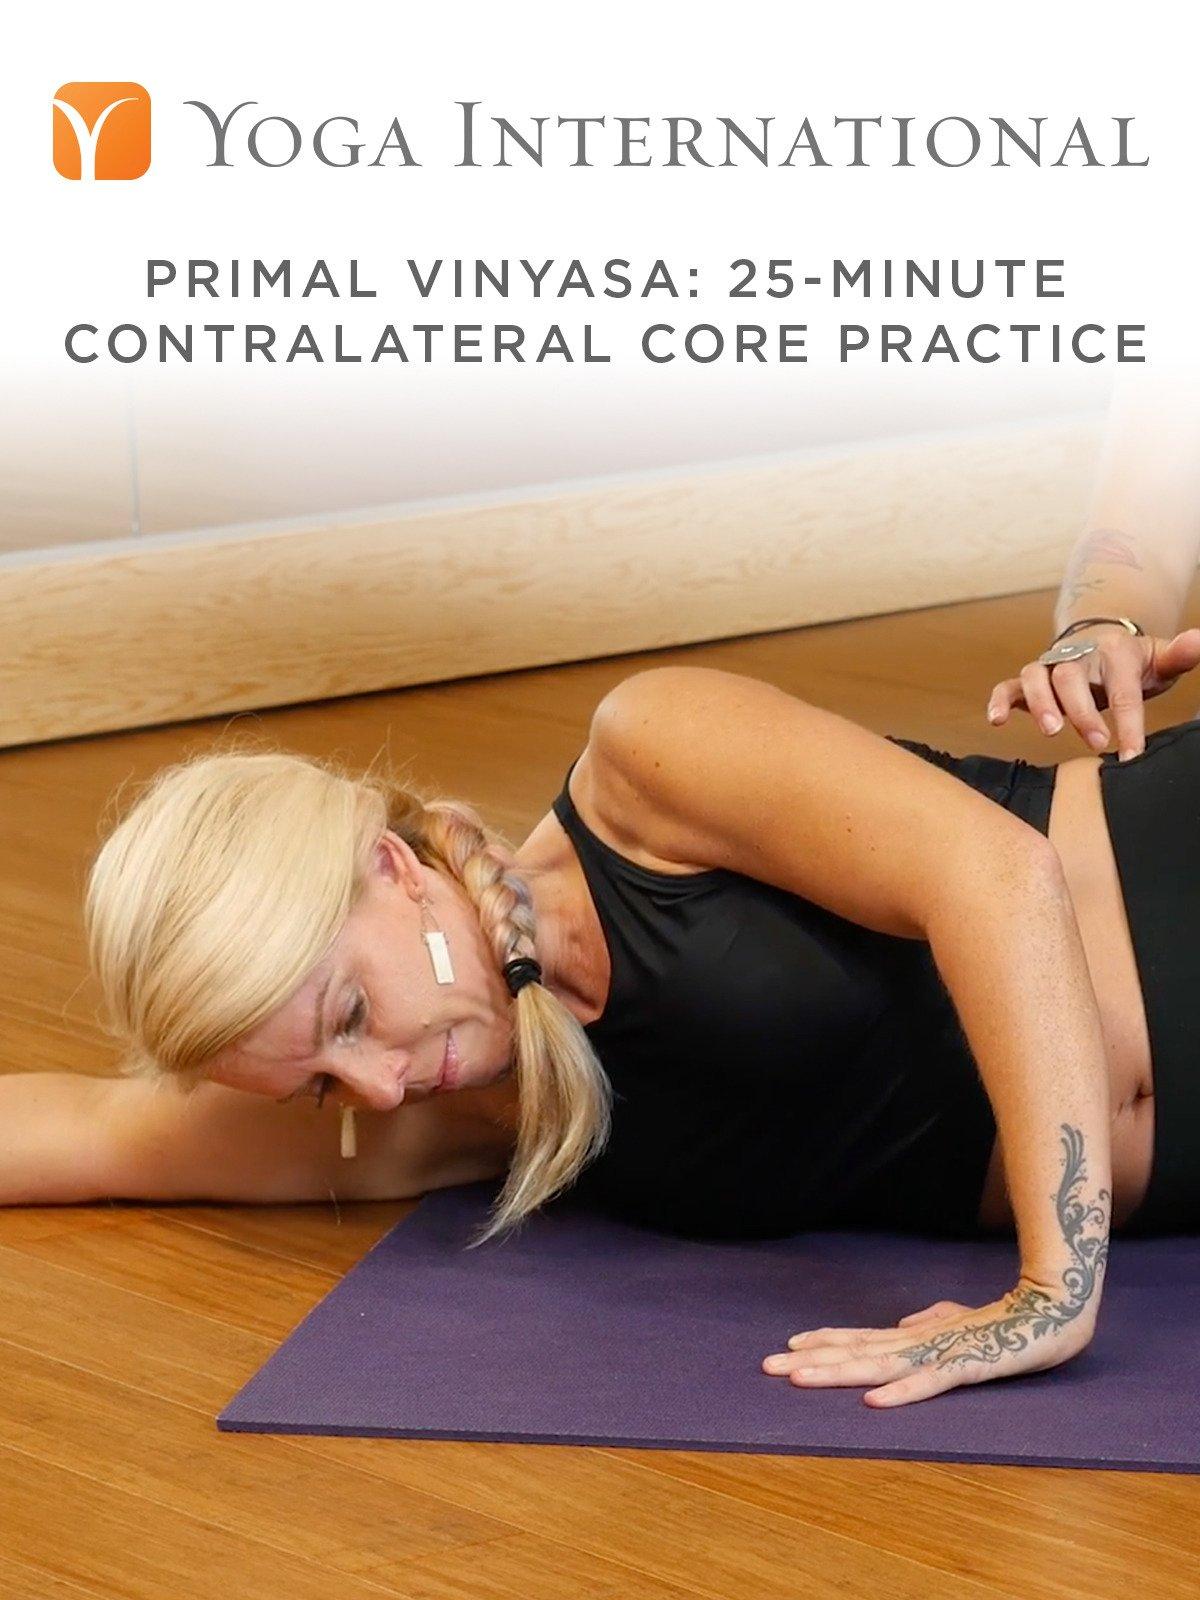 Primal Vinyasa: 25-Minute Contralateral Core Practice